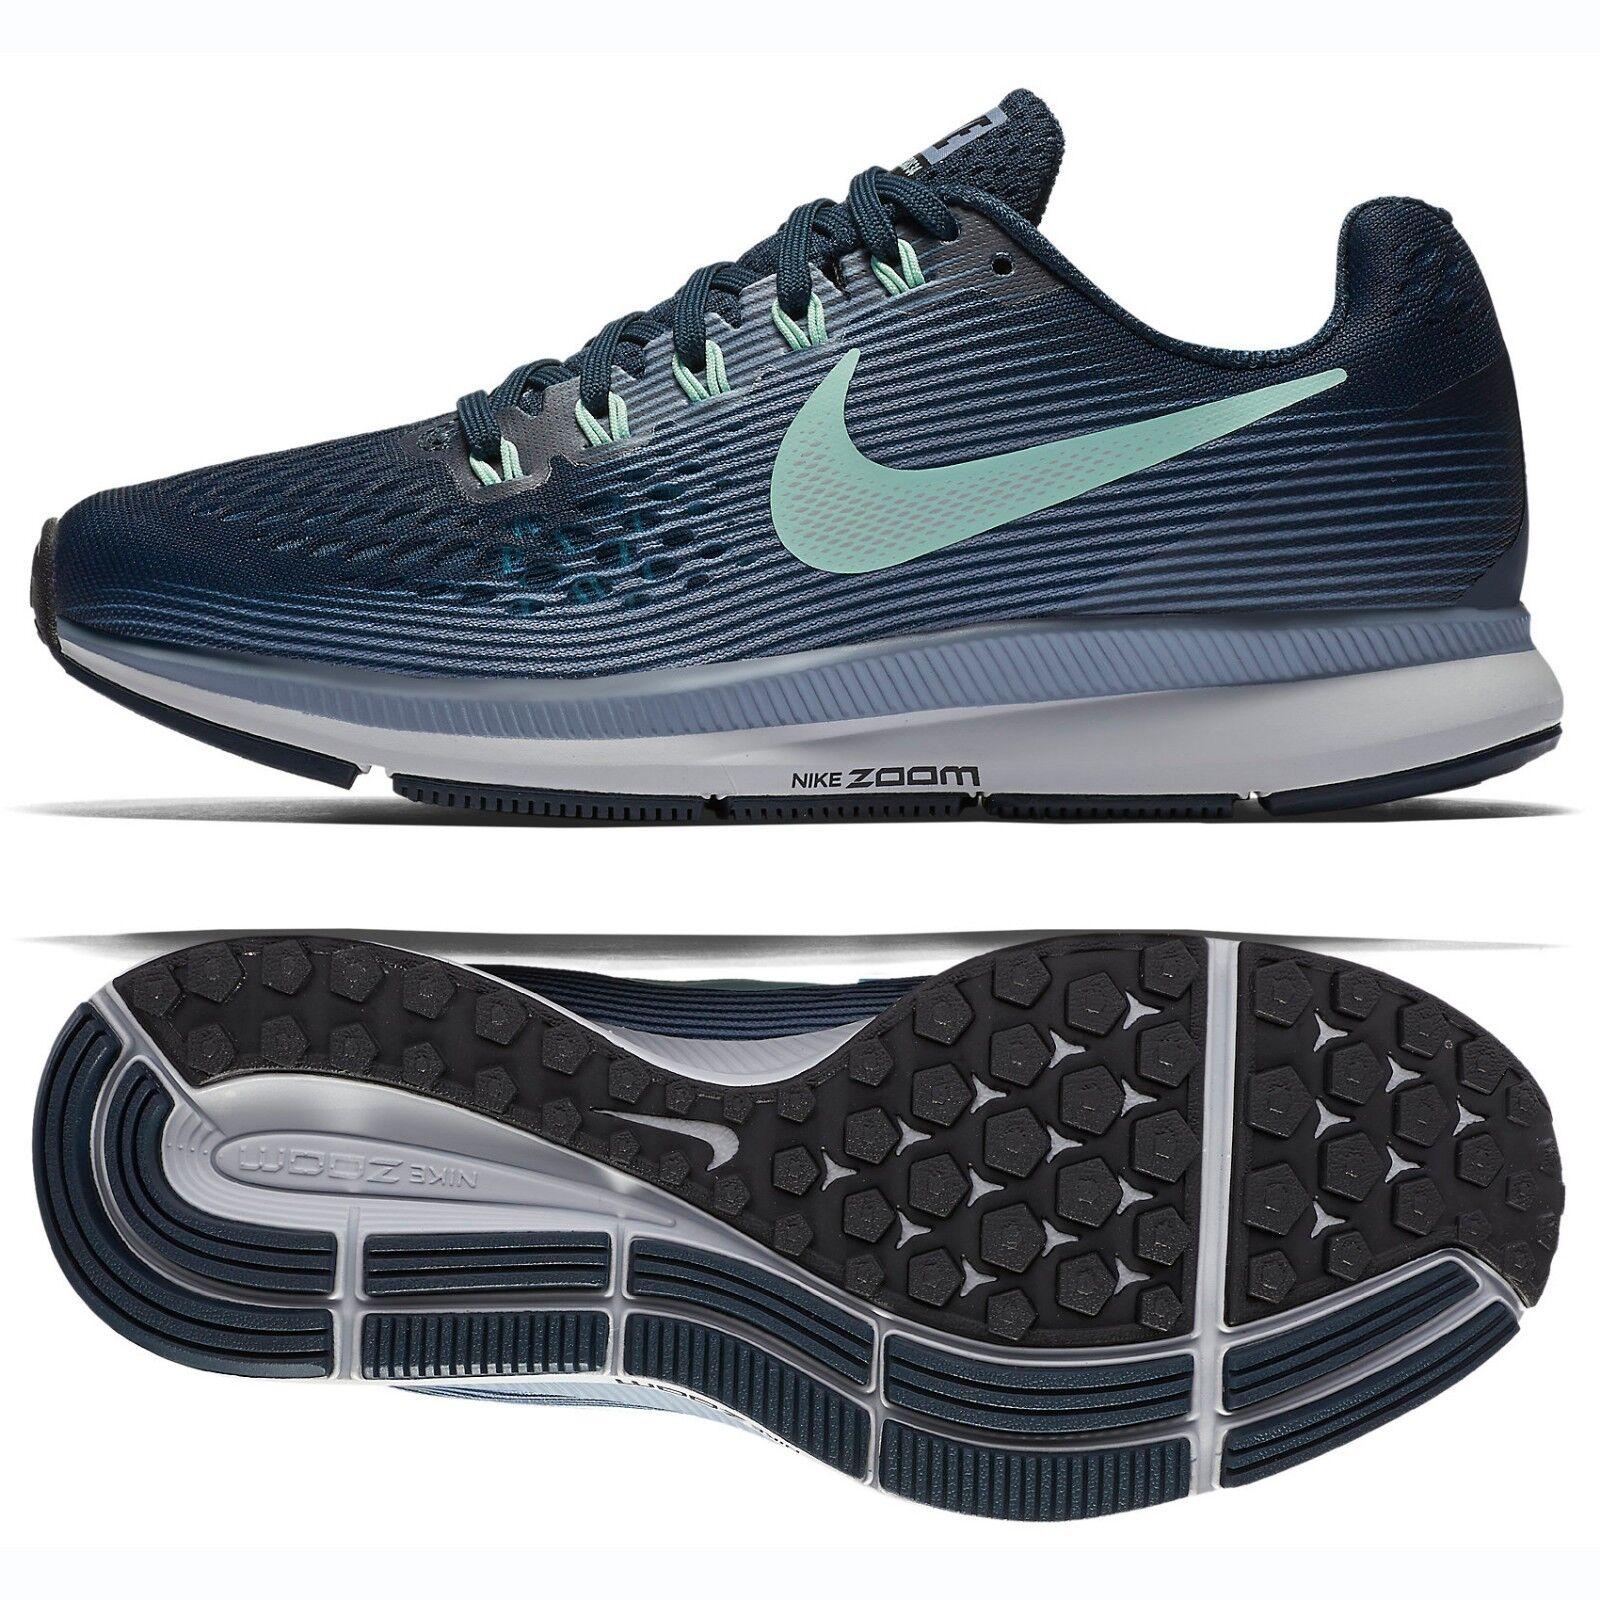 Nike WMNS Air Zoom Pegasus 34 880560-405 Navy Mint Foam Women's Running shoes